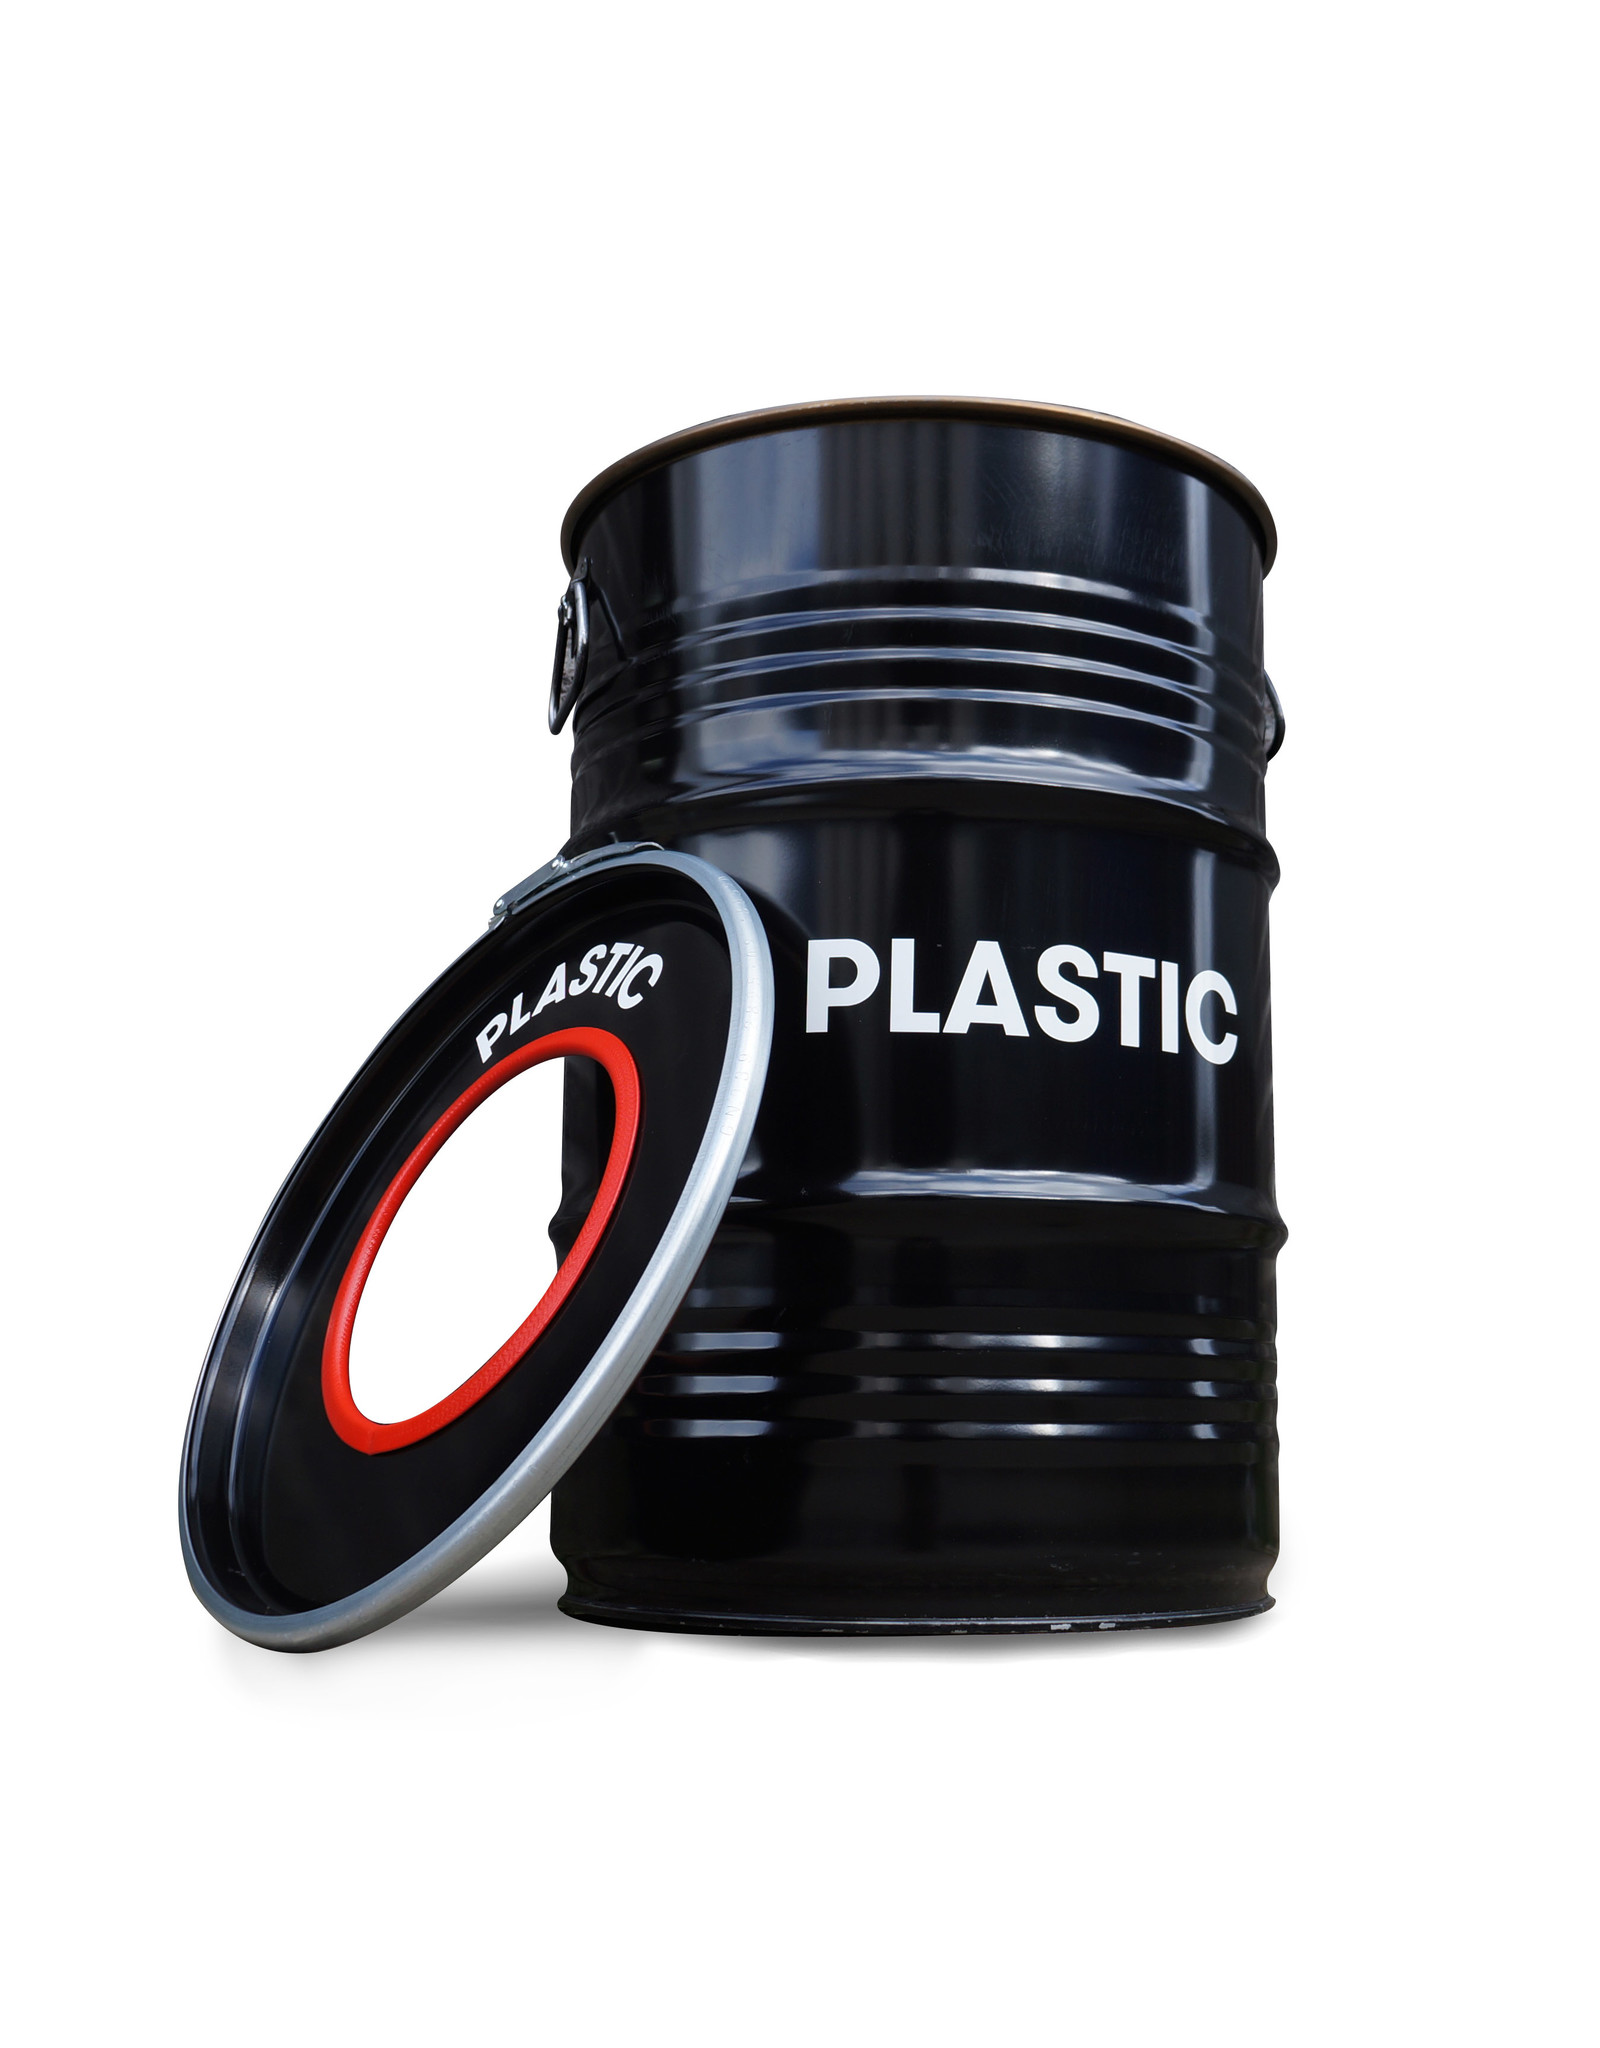 The Binbin BinBin Hole Plastic industriële prullenbak afvalscheiding 60 Liter